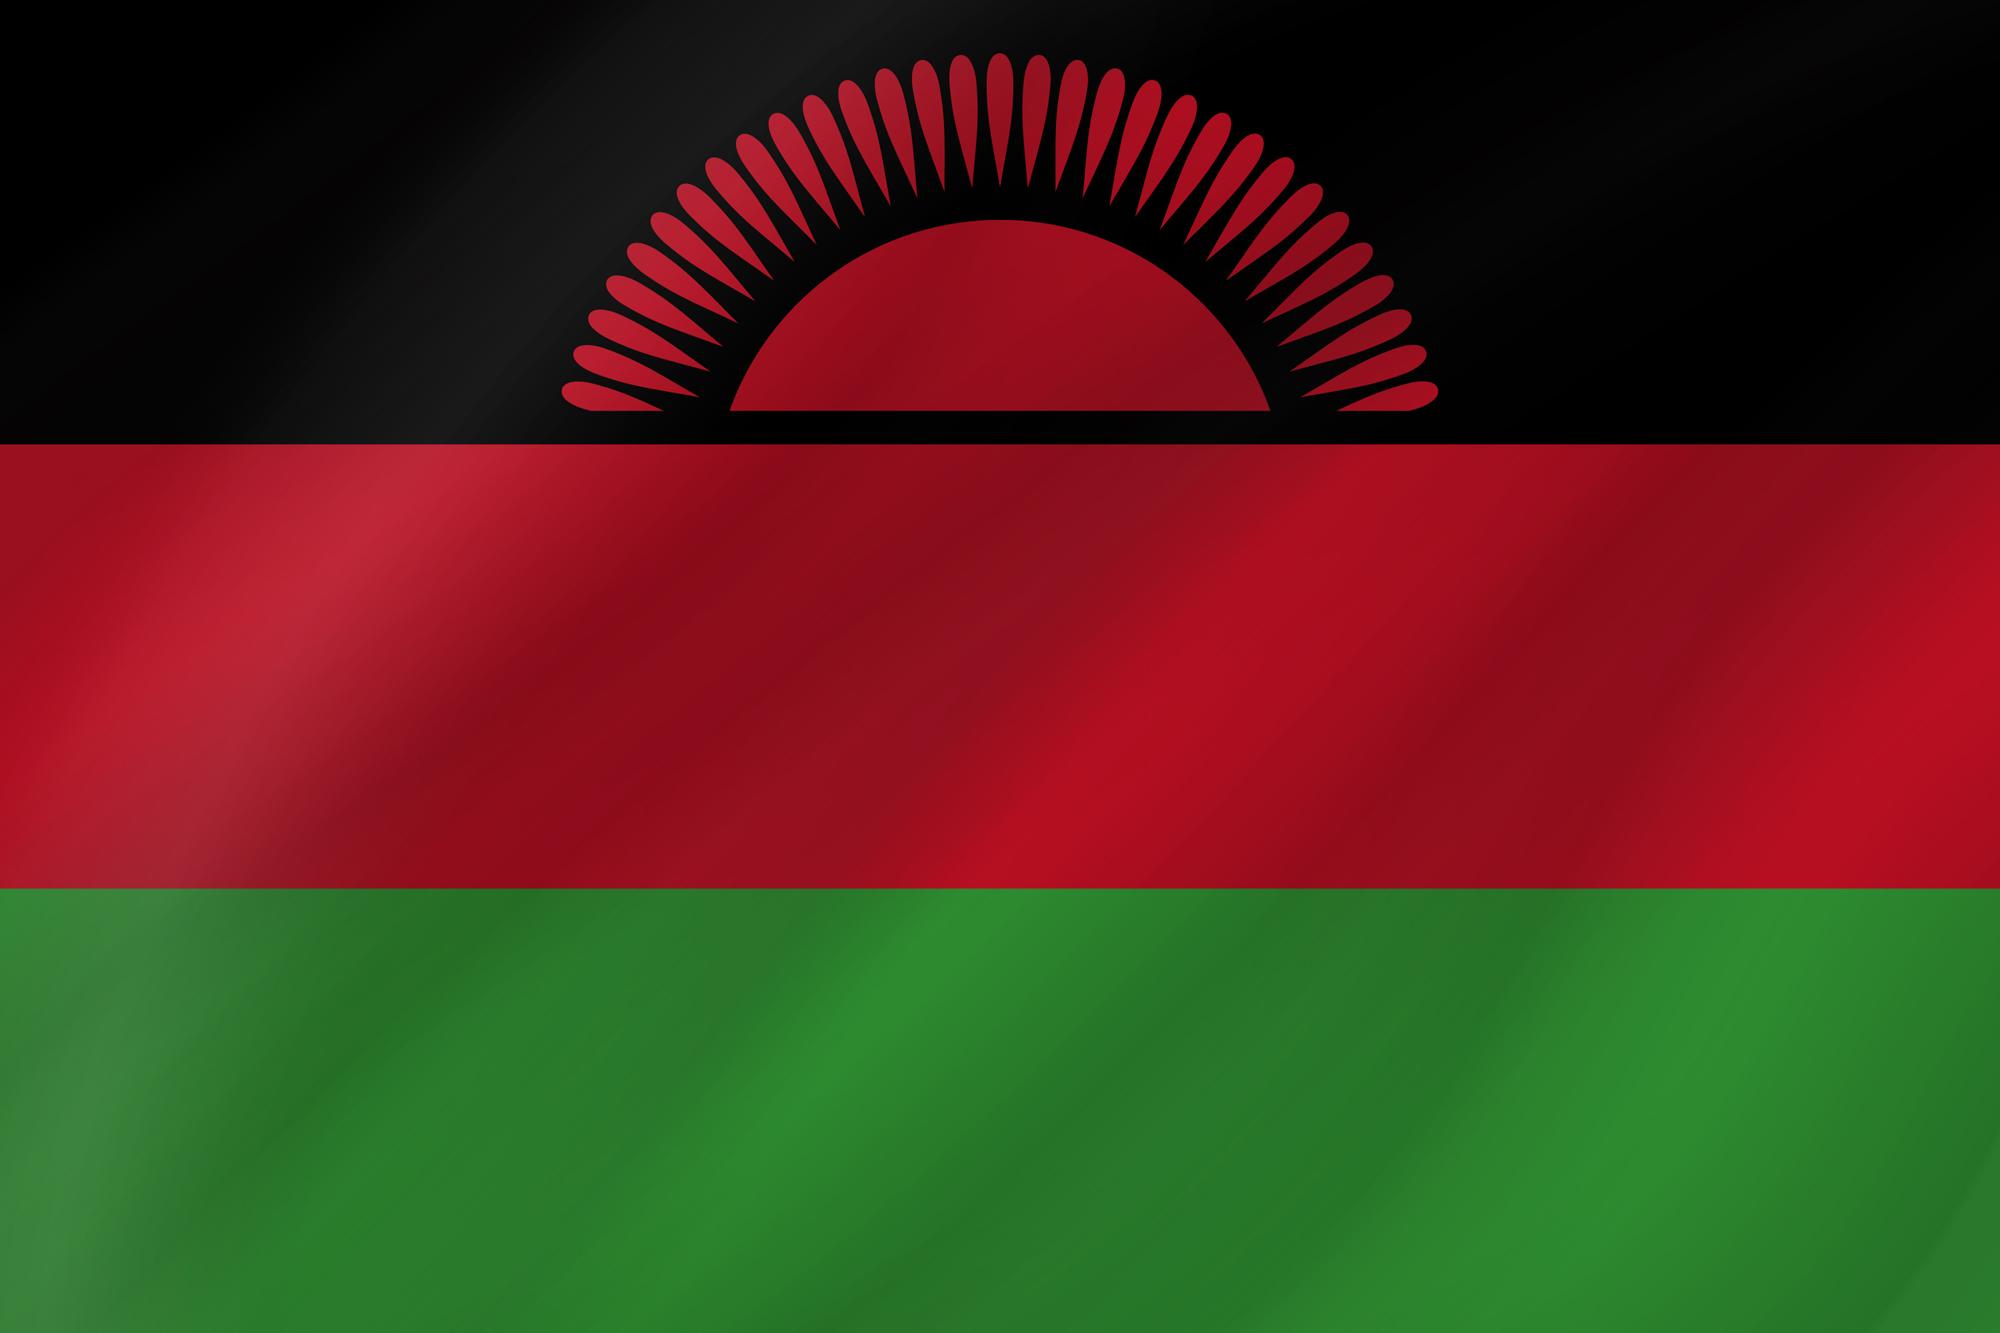 MALAWI: CHALLENGING DETENTION OF CHILDREN IN POLICE CUSTODY